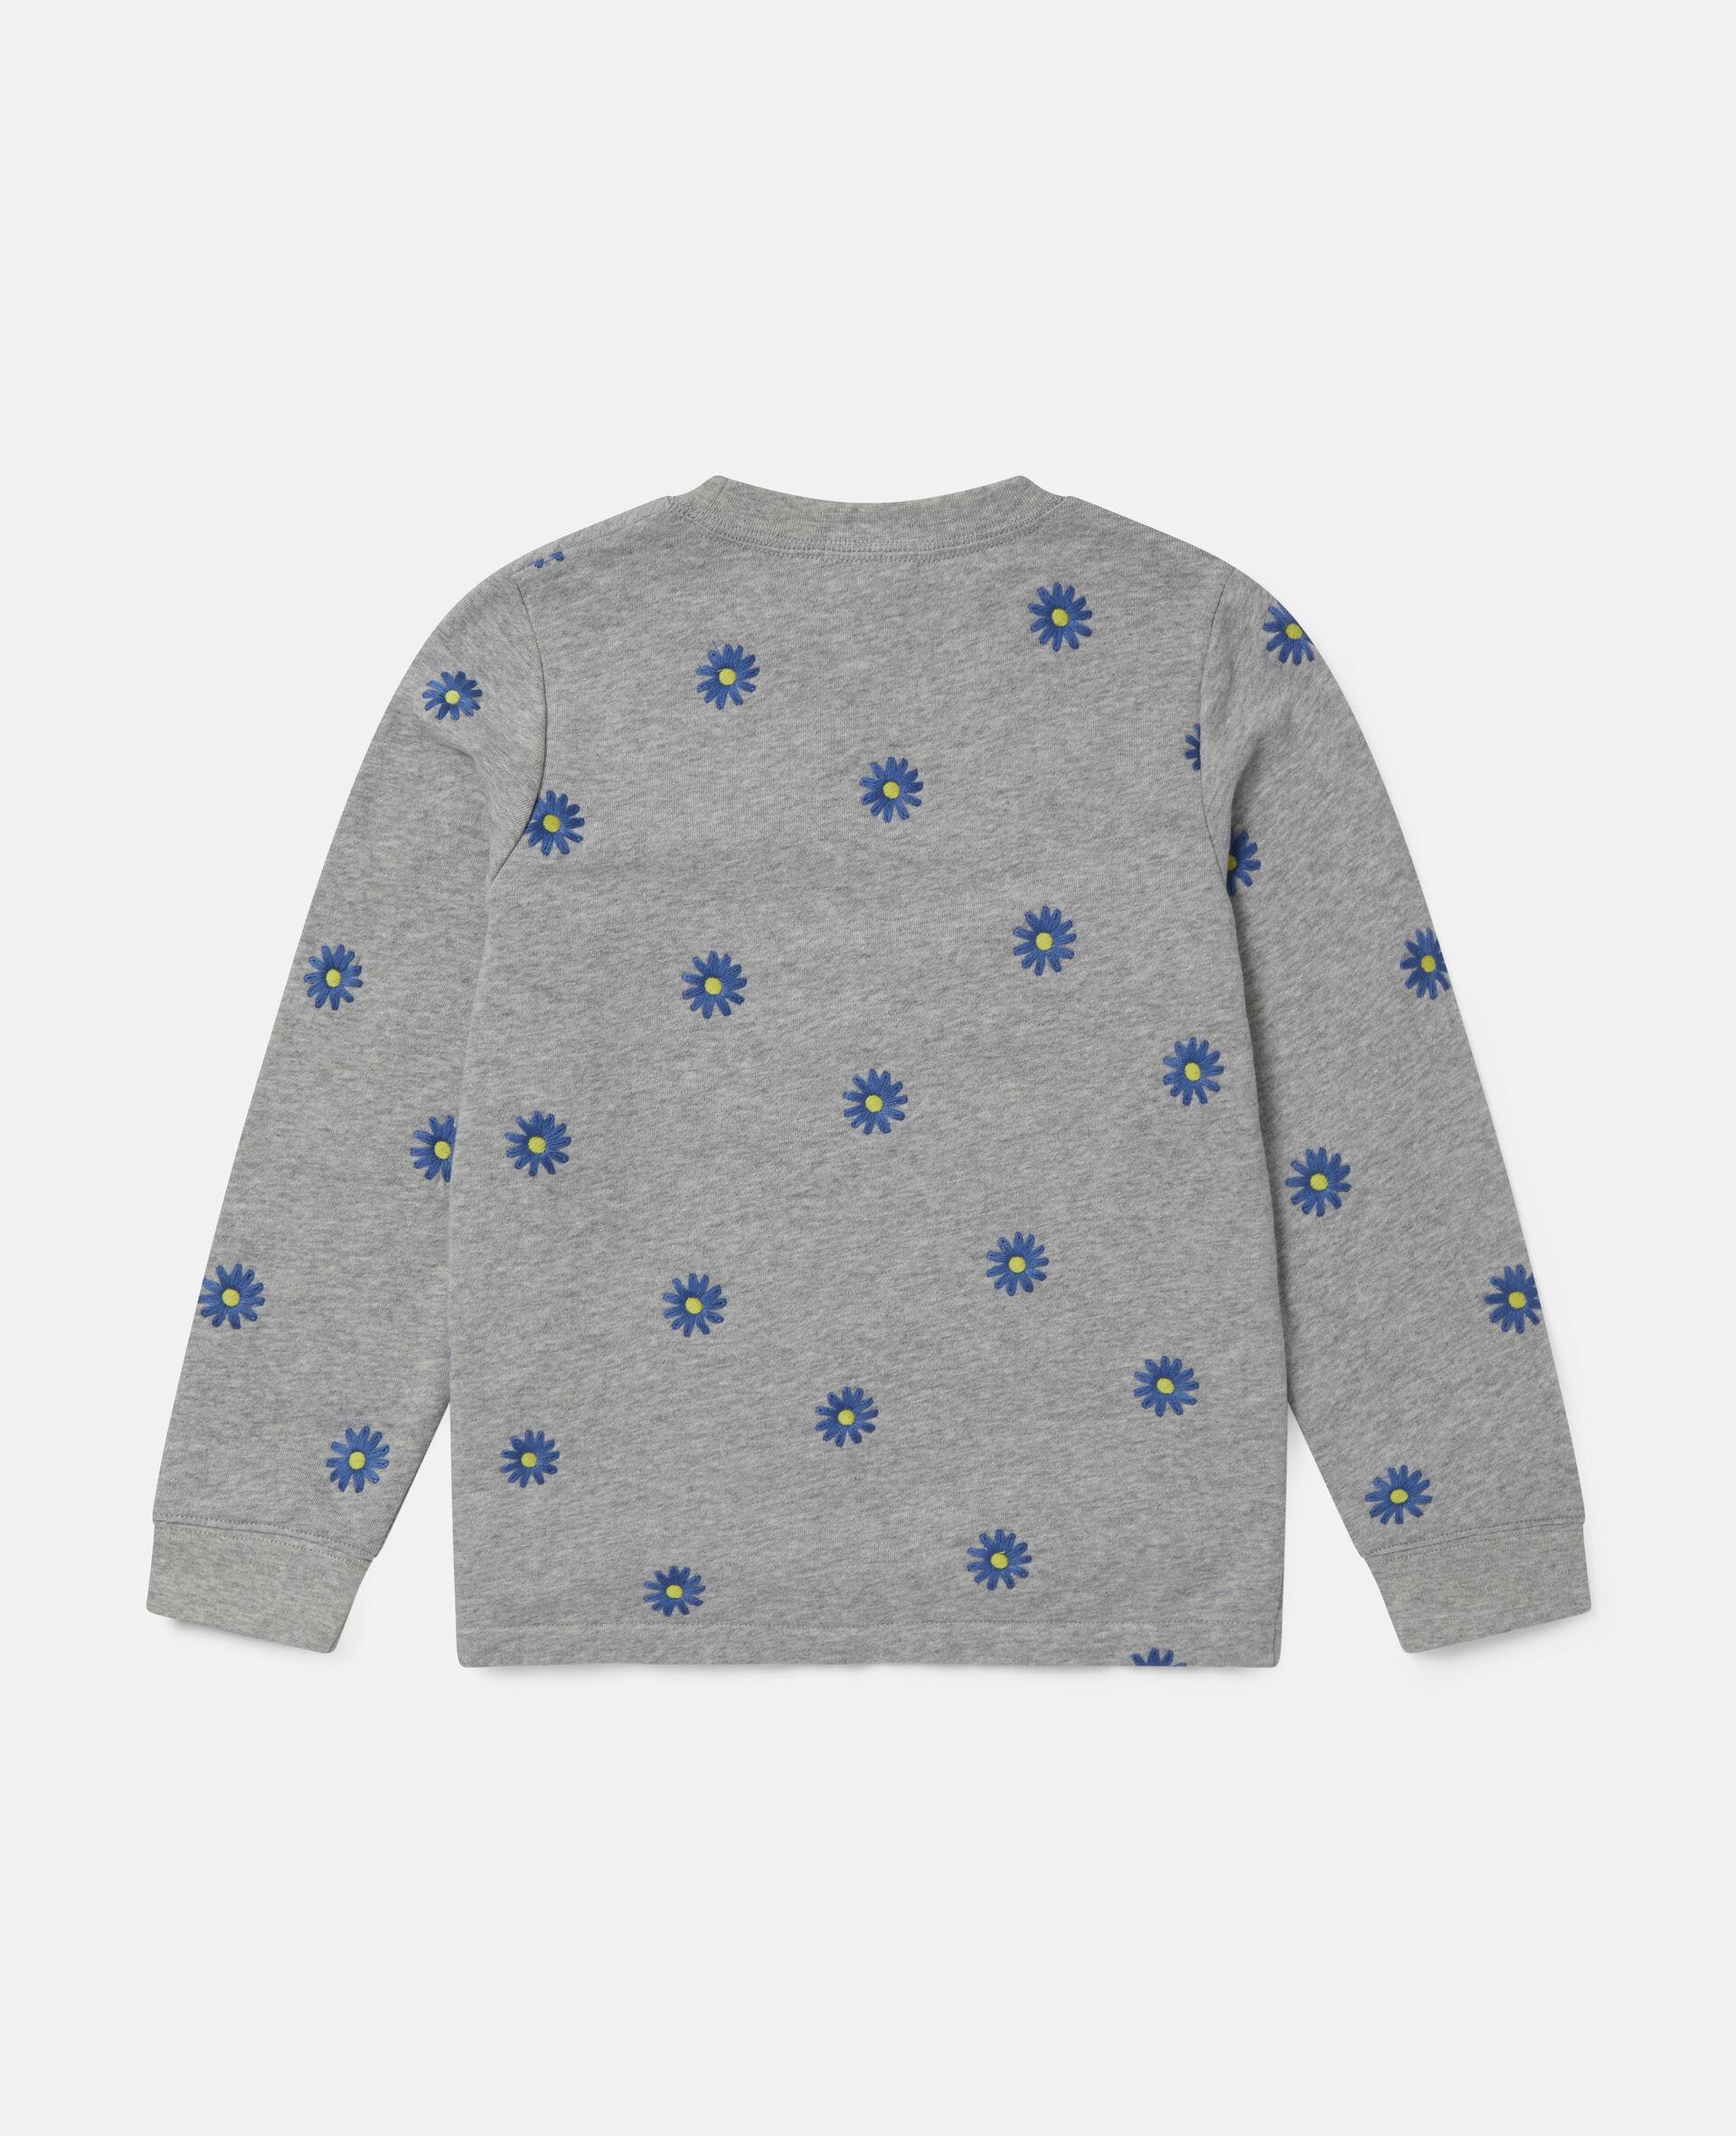 Baumwollfleece-Sweatshirt mit Gänseblümchenmotiv -Grau-large image number 3